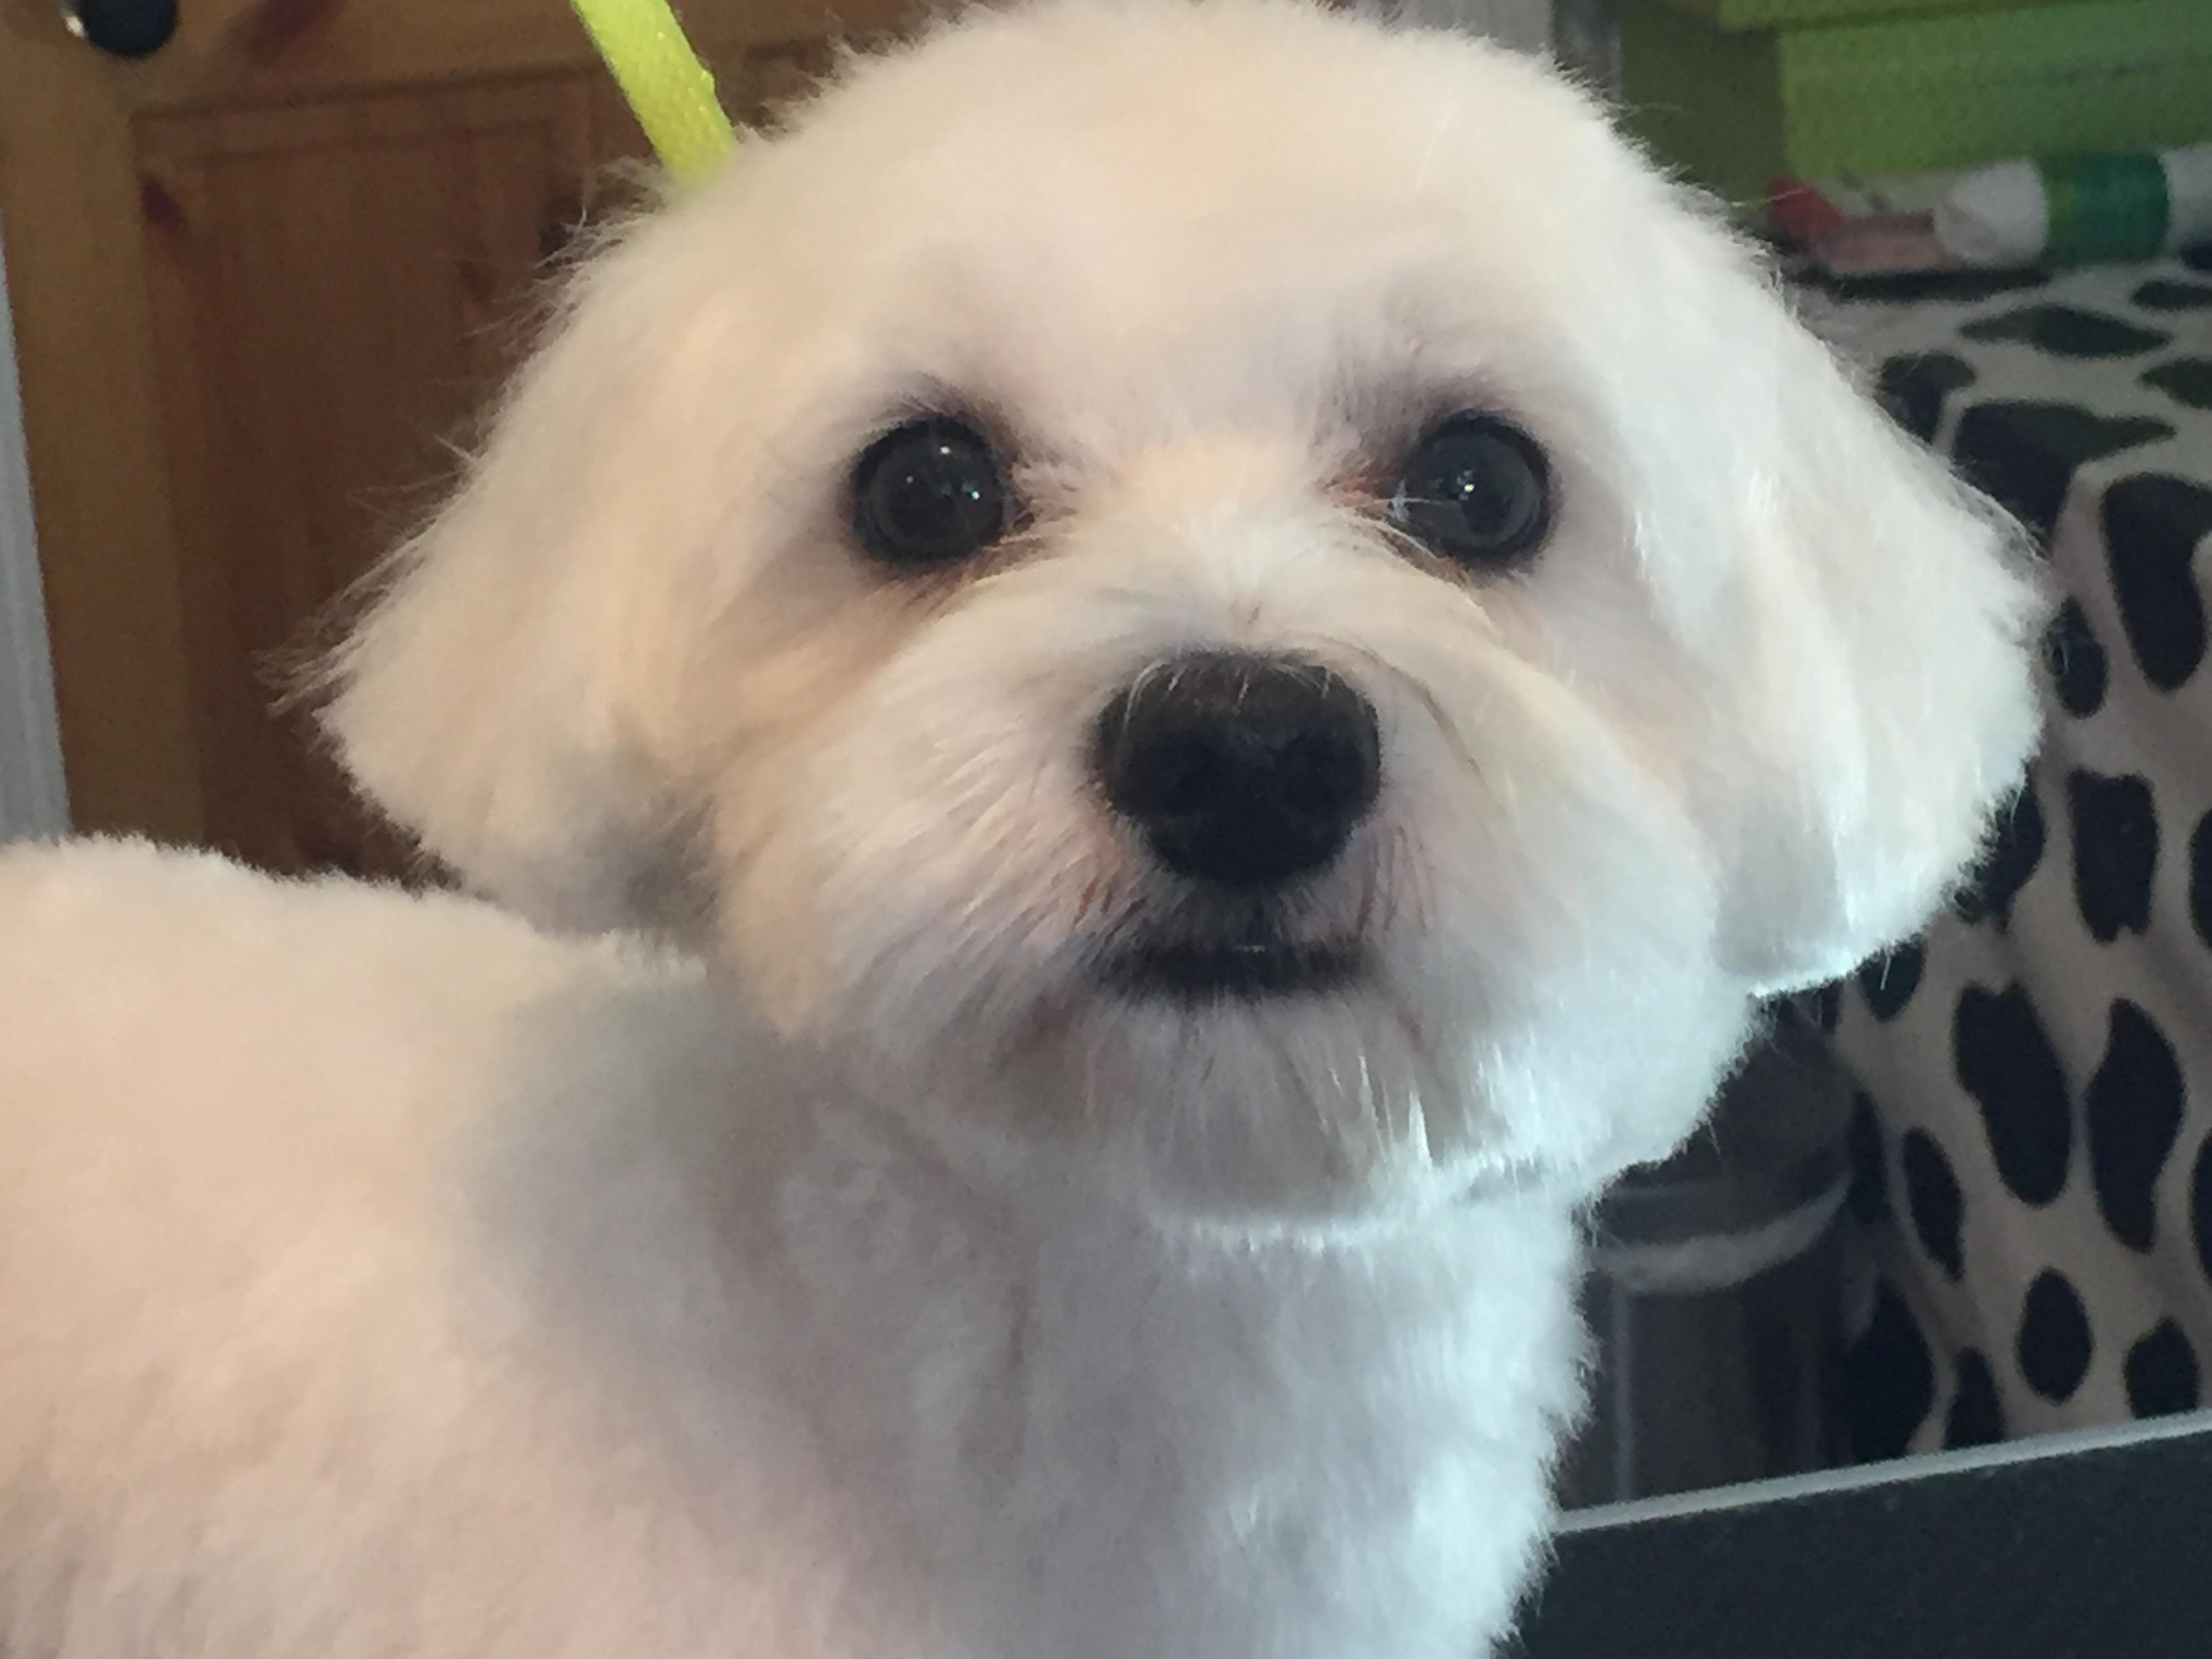 Hornsey N8 Dog grooming